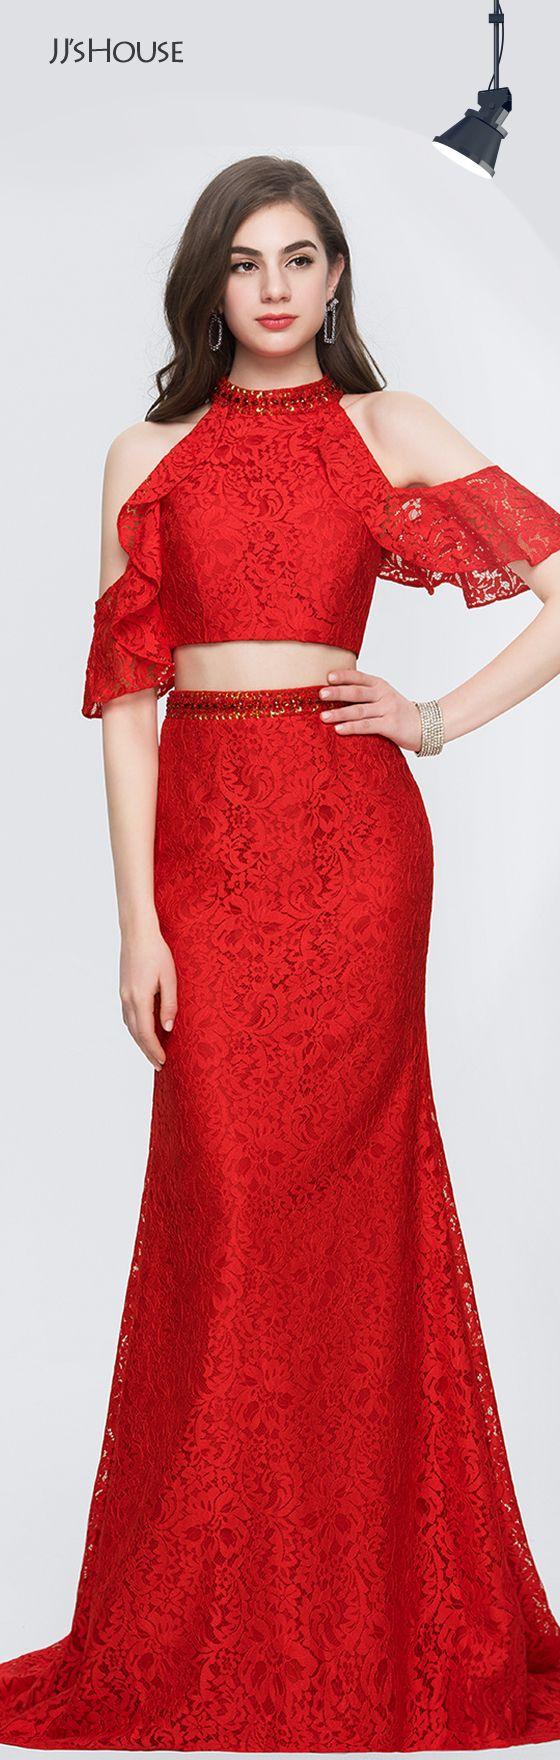 Jjshouse promdresses vestido gala pinterest móda